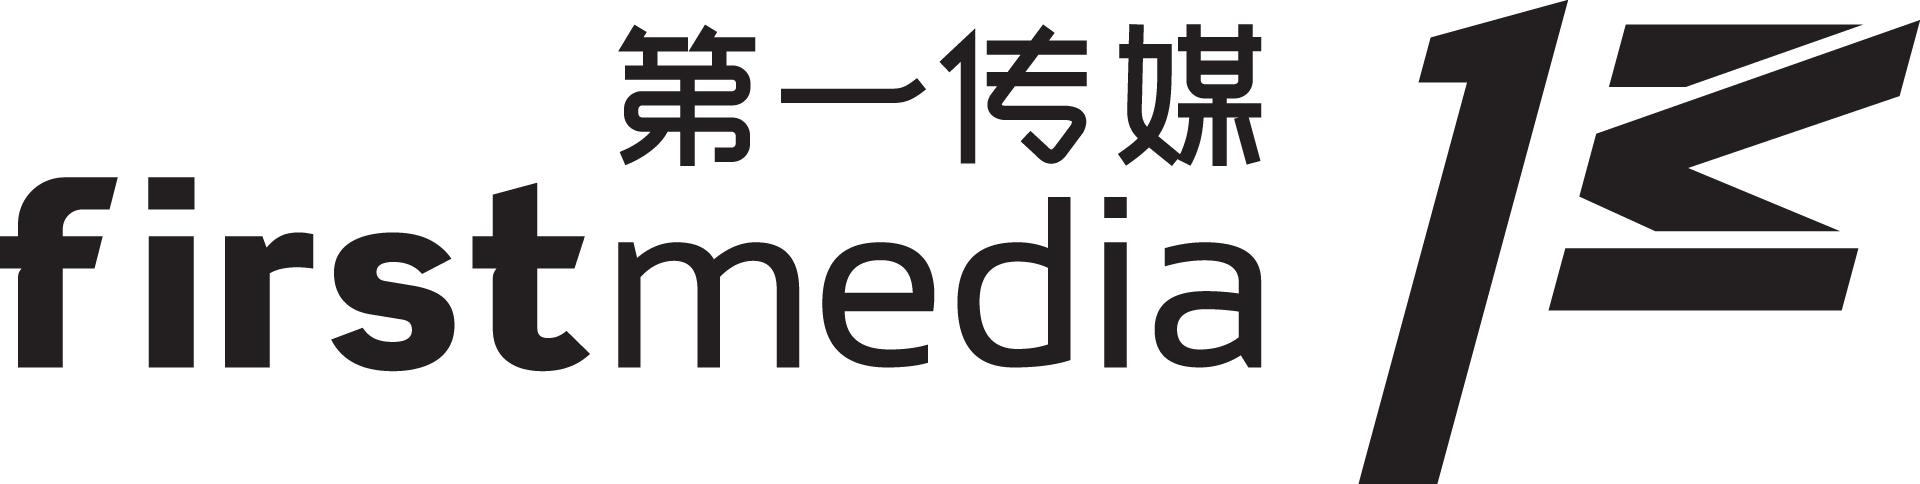 First Media Australia